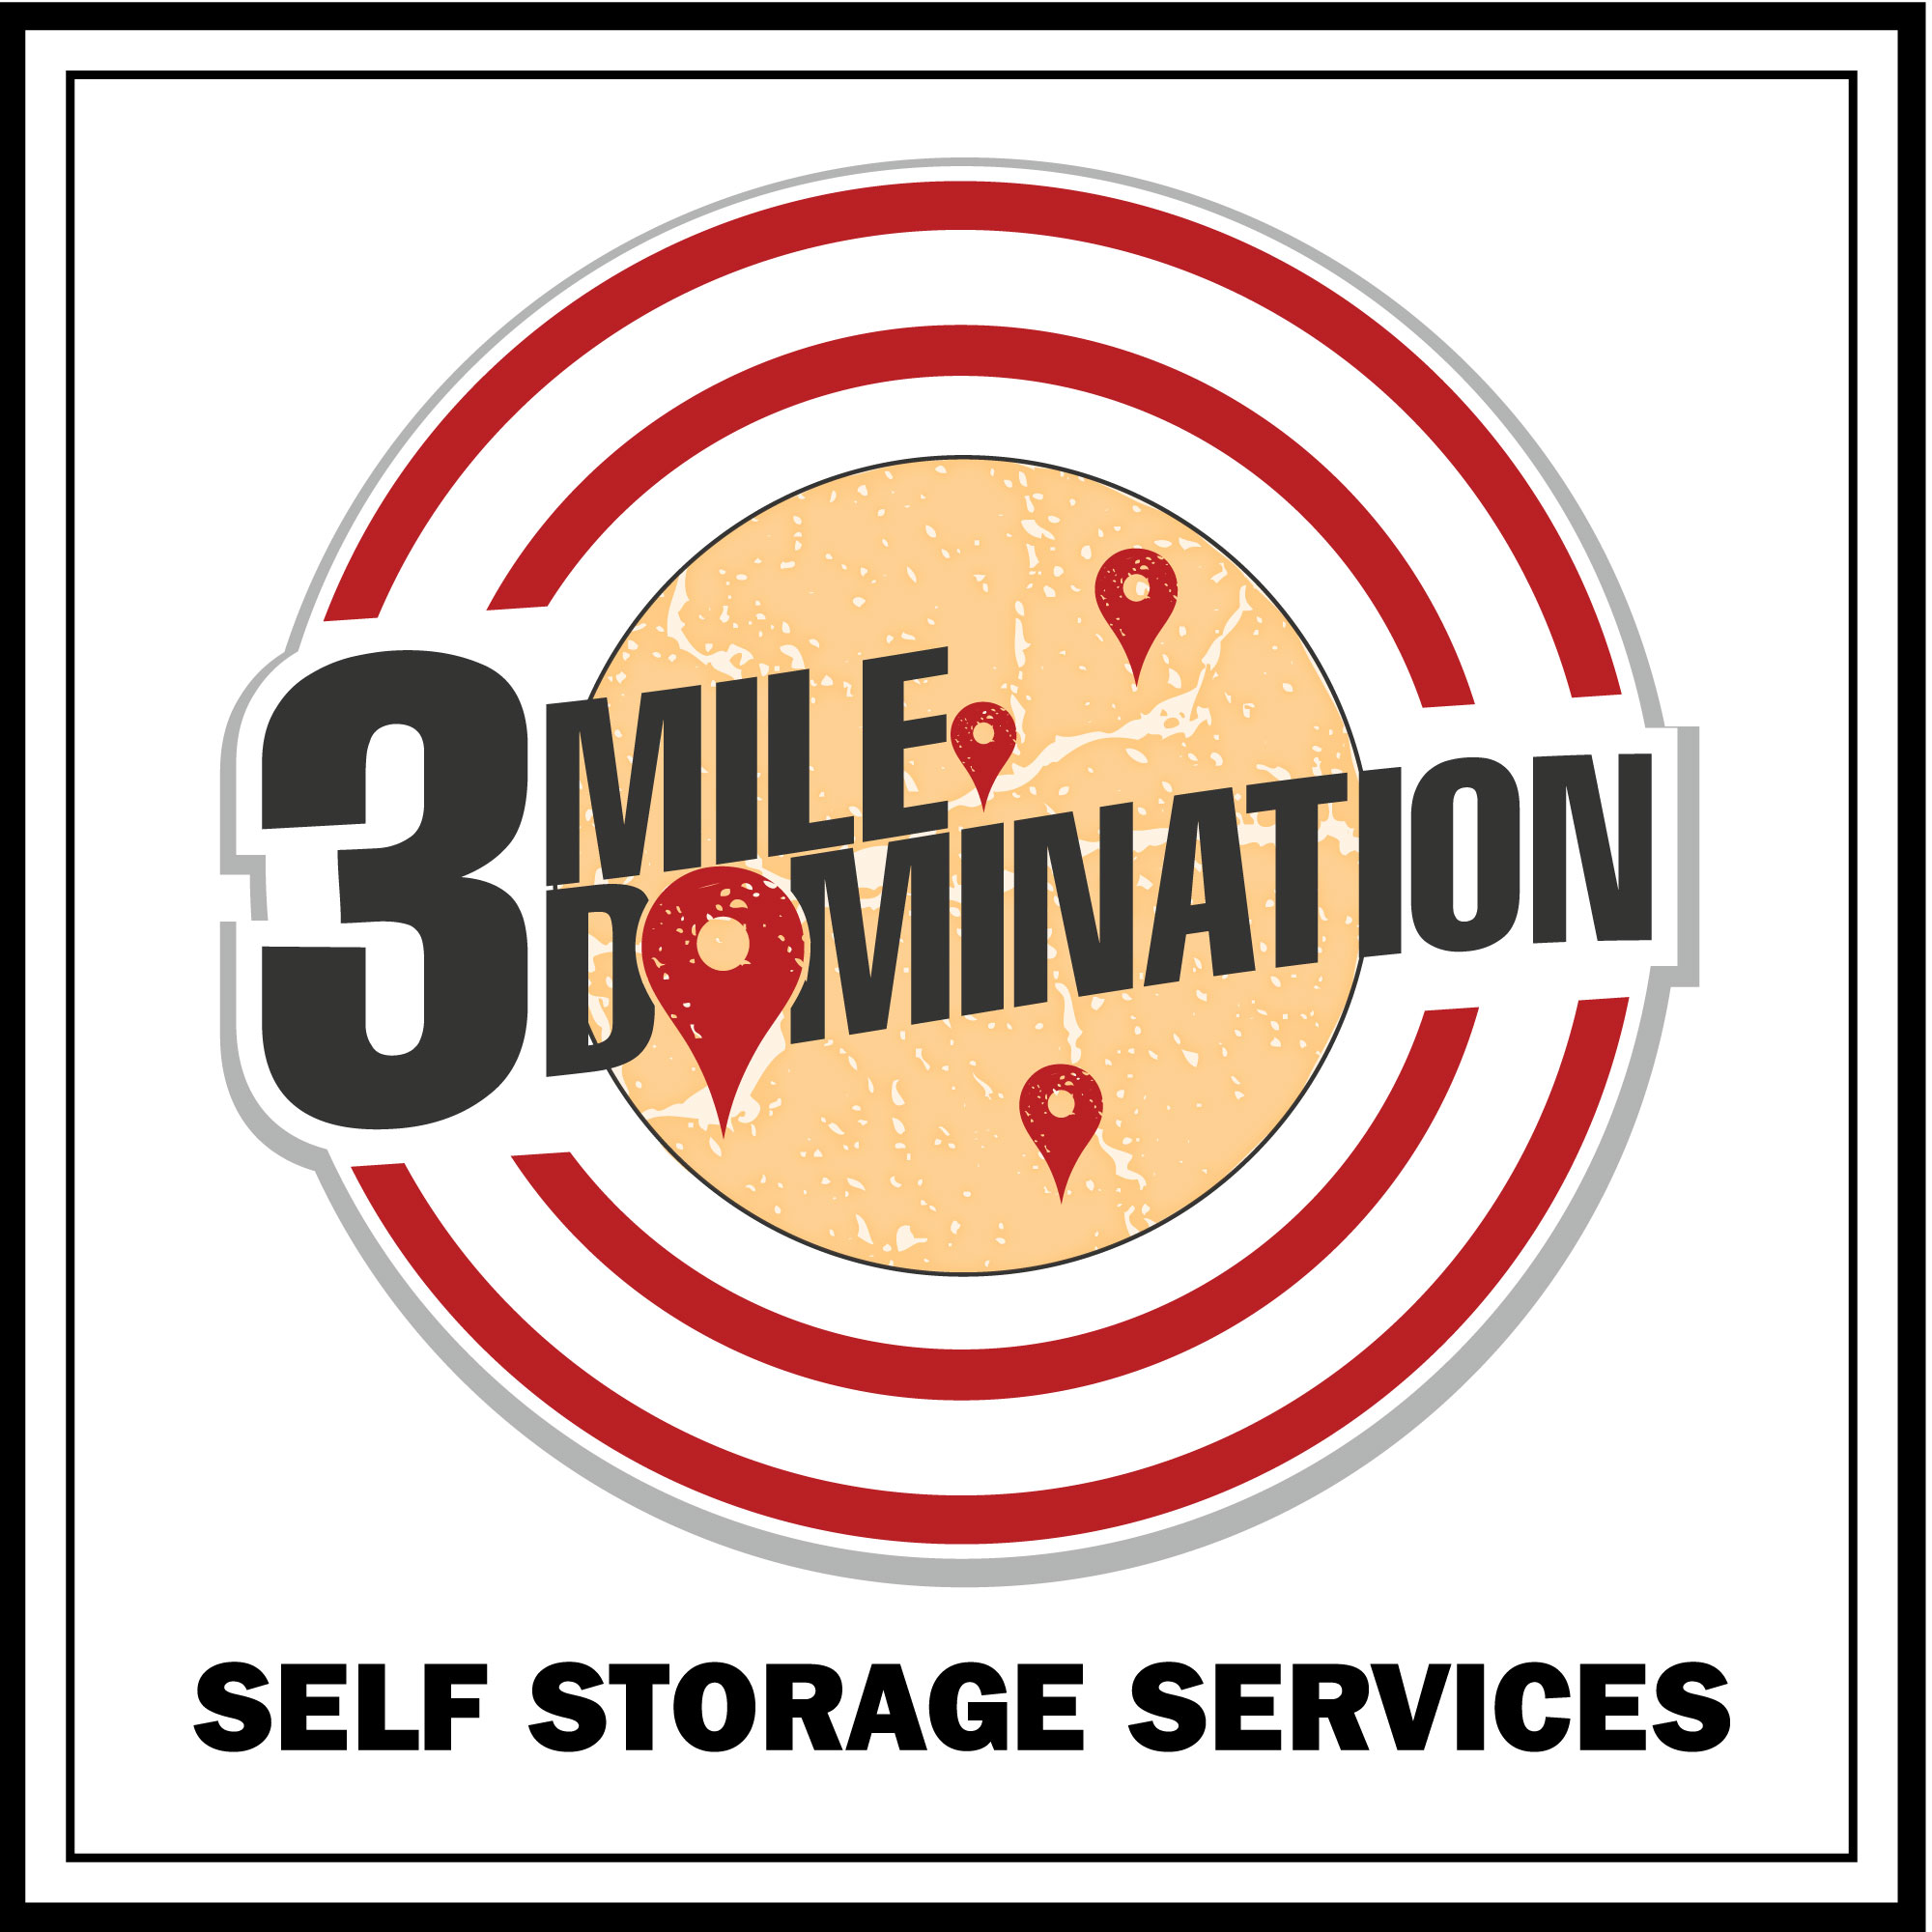 3 Mile Domination - Self Storage Services